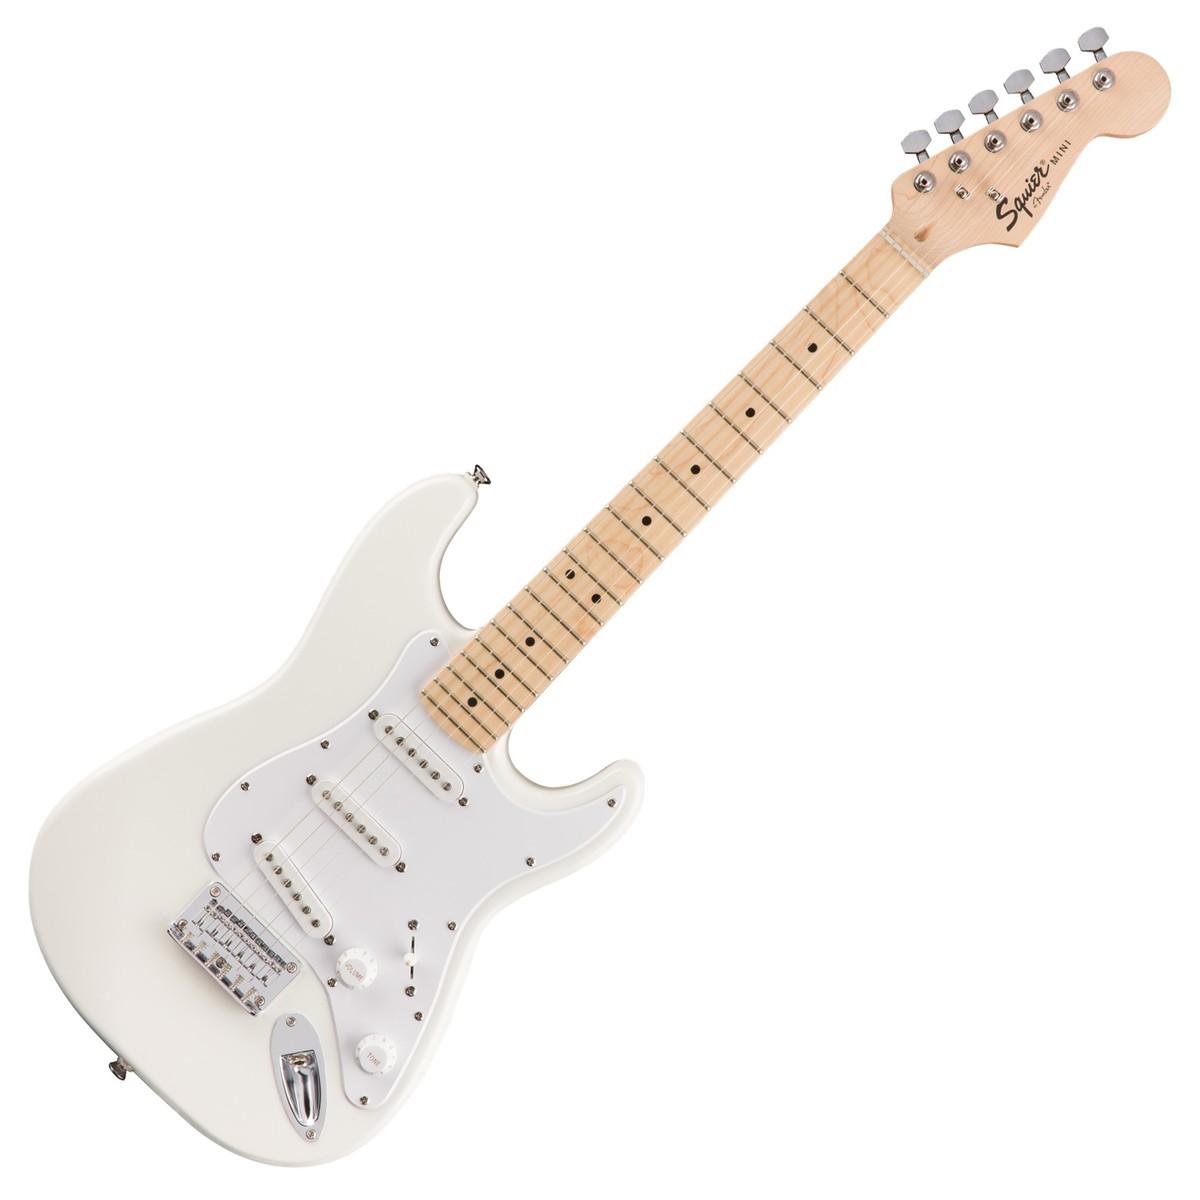 Fender Squier Standard Strat Mn Ab Review Best 2018 Stratocaster Guitars Gumtree